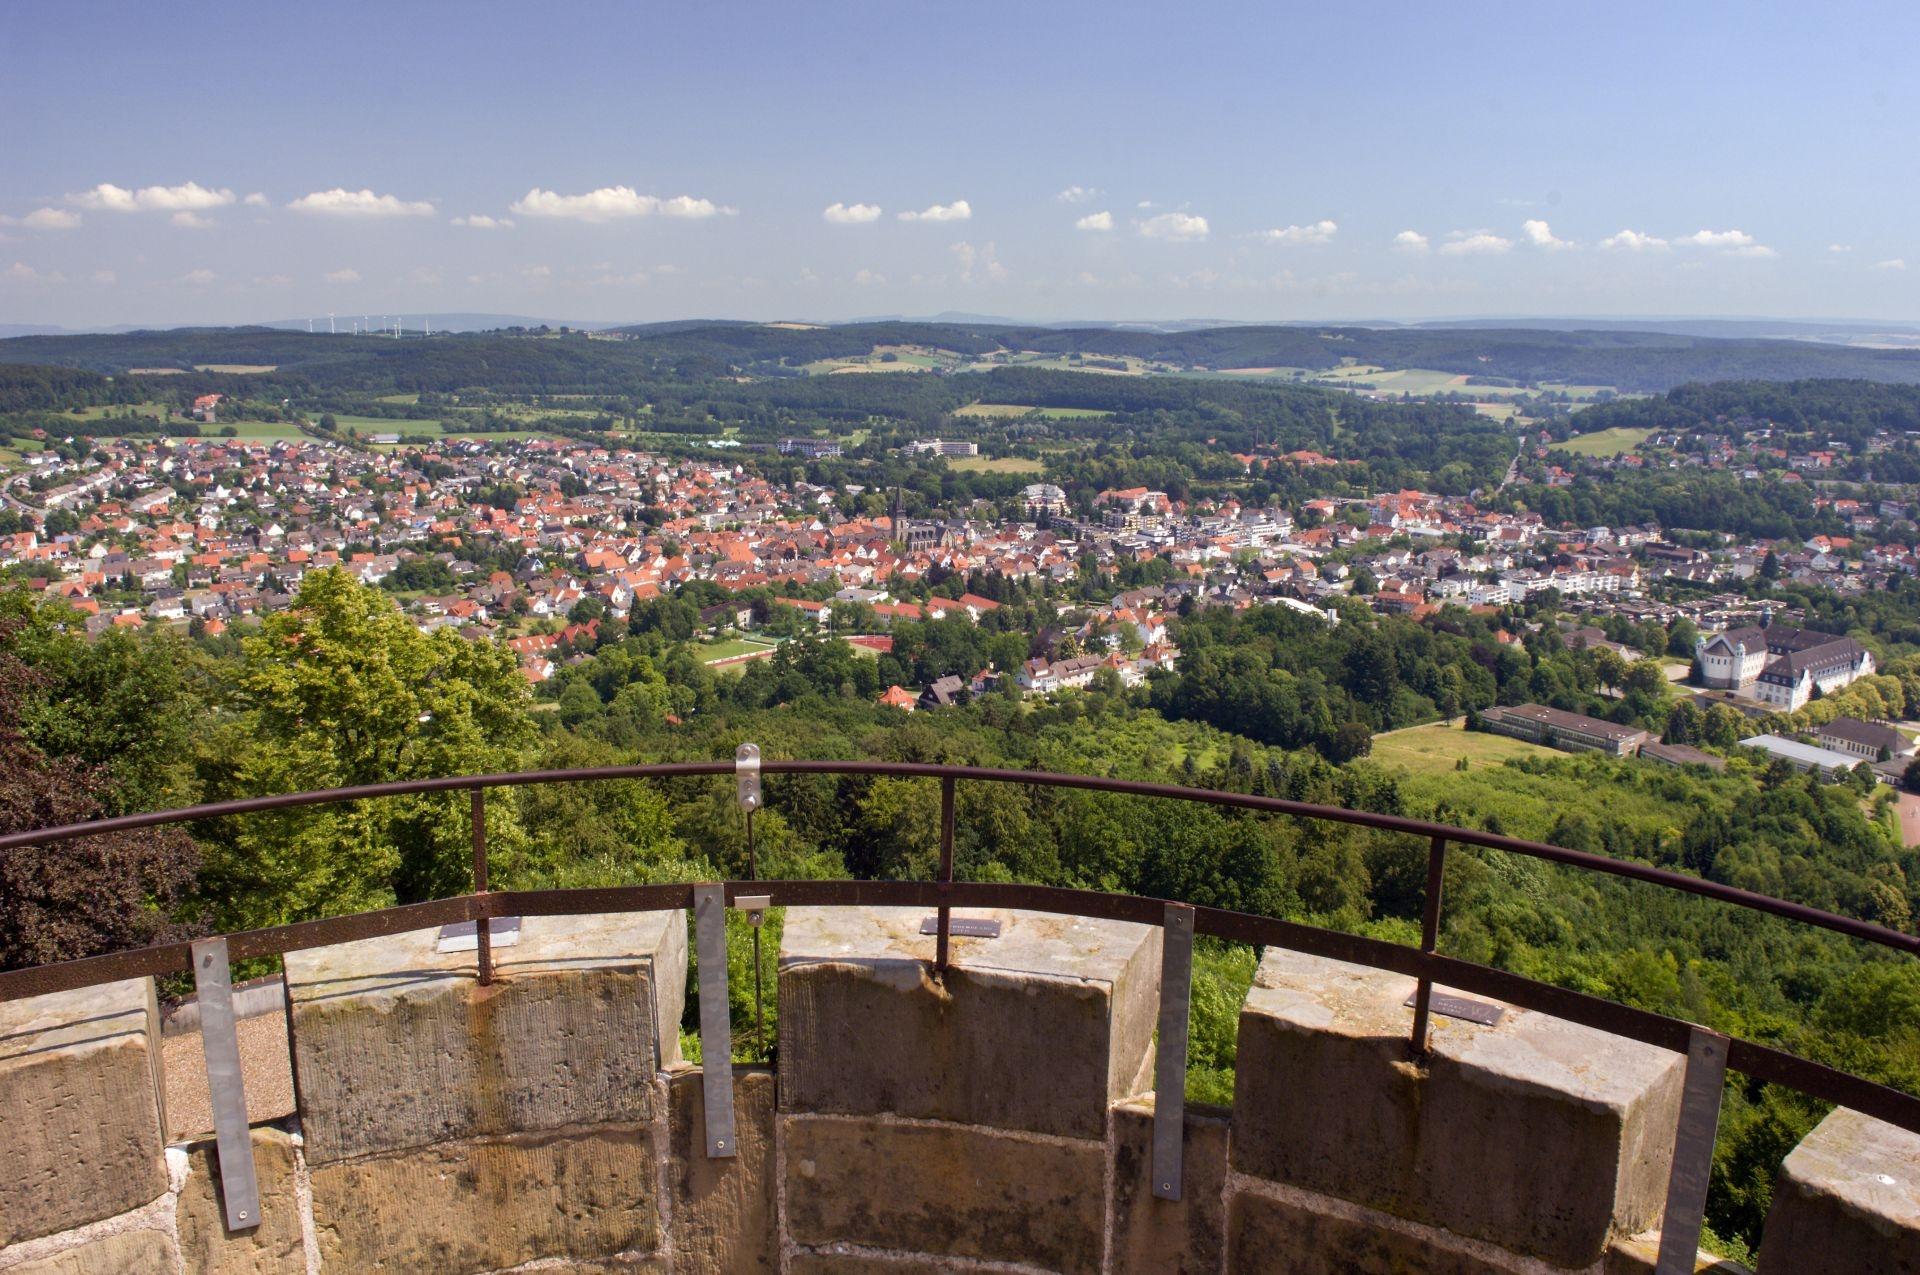 Blick vom Kaiser-Karls-Turm über Bad Driburg